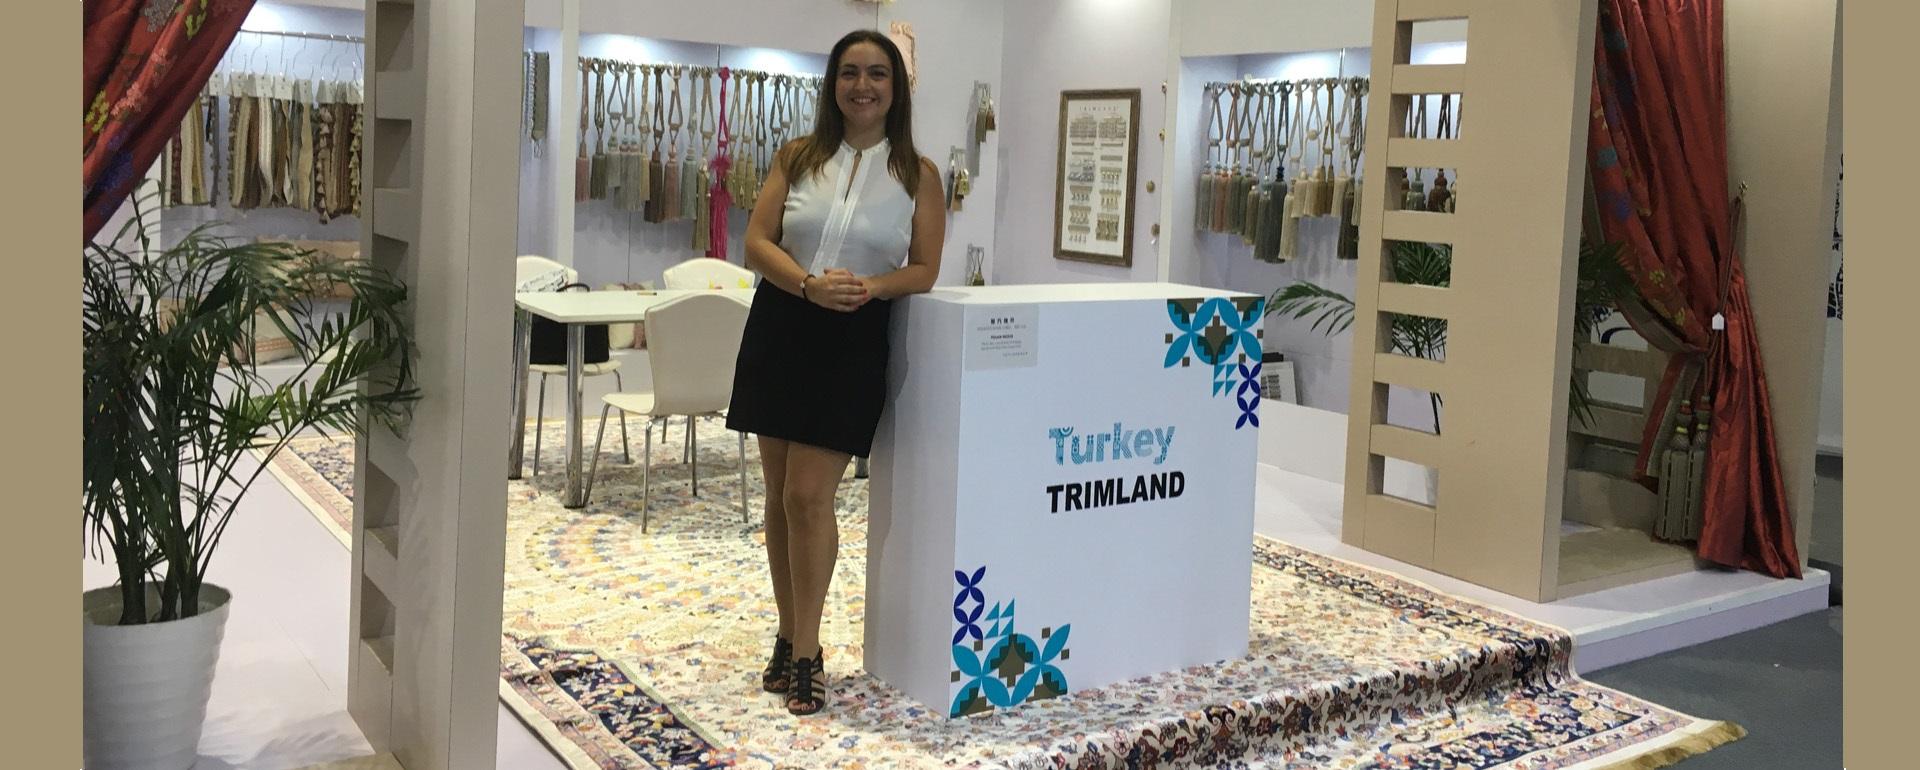 7 Trimland